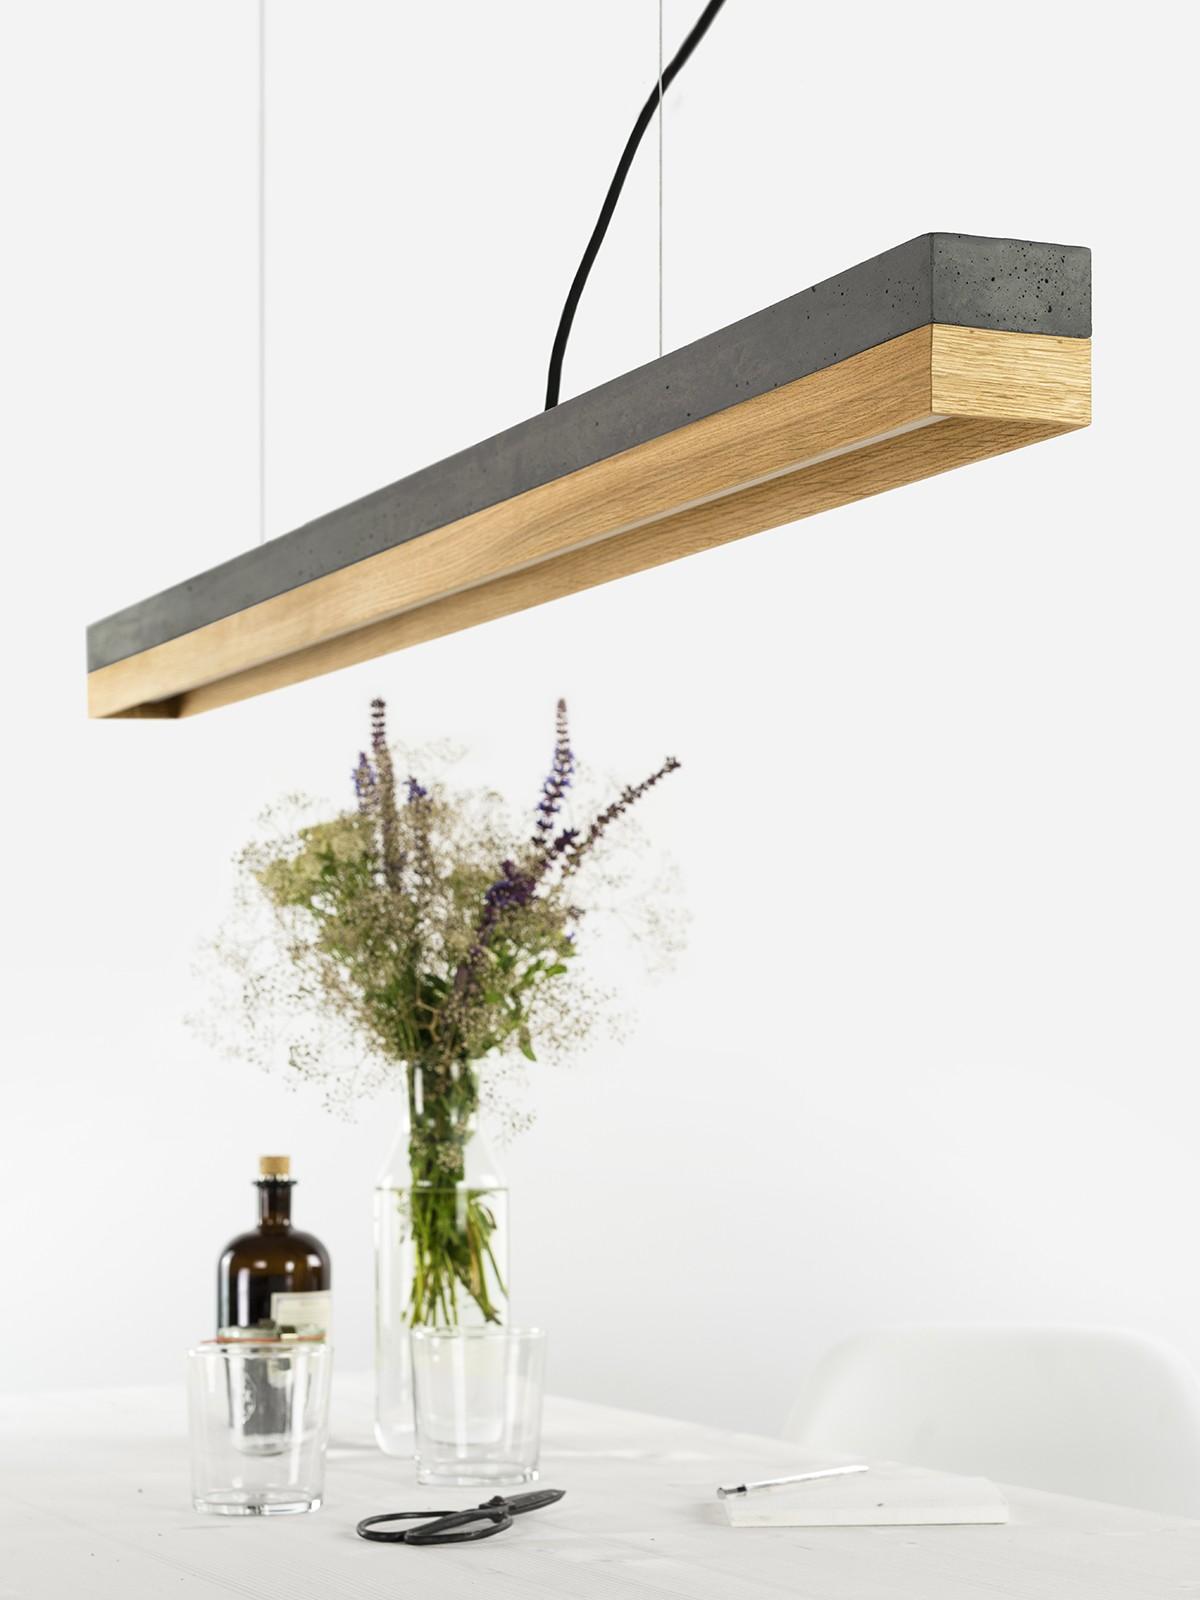 [C1] OAK - Dimmable LED - Concrete & Oak Pendant Light Dimmable, Dark Grey Concrete, Oak